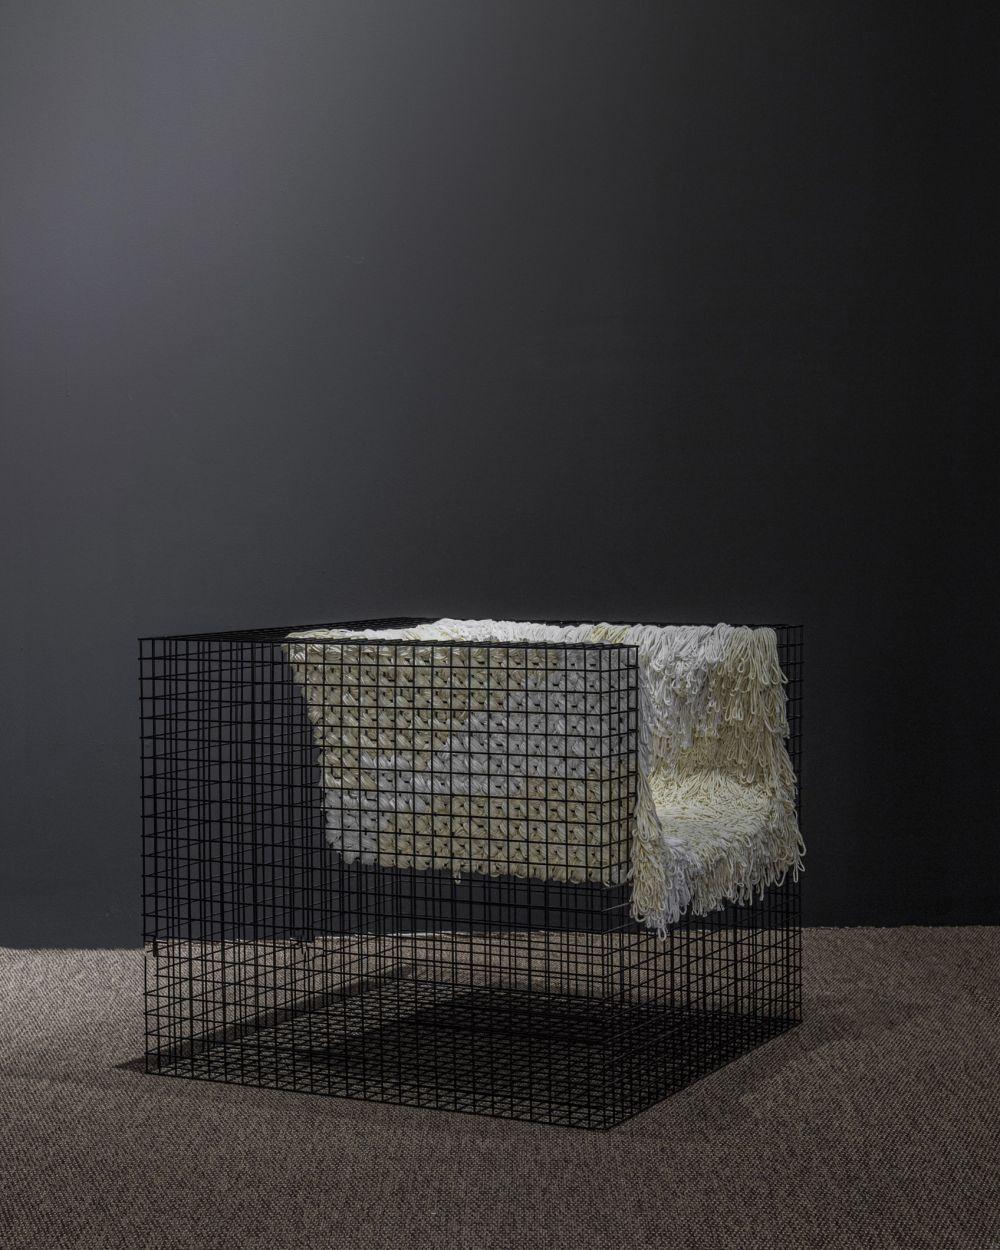 GEDION KIM Fil métallique, fil de coton